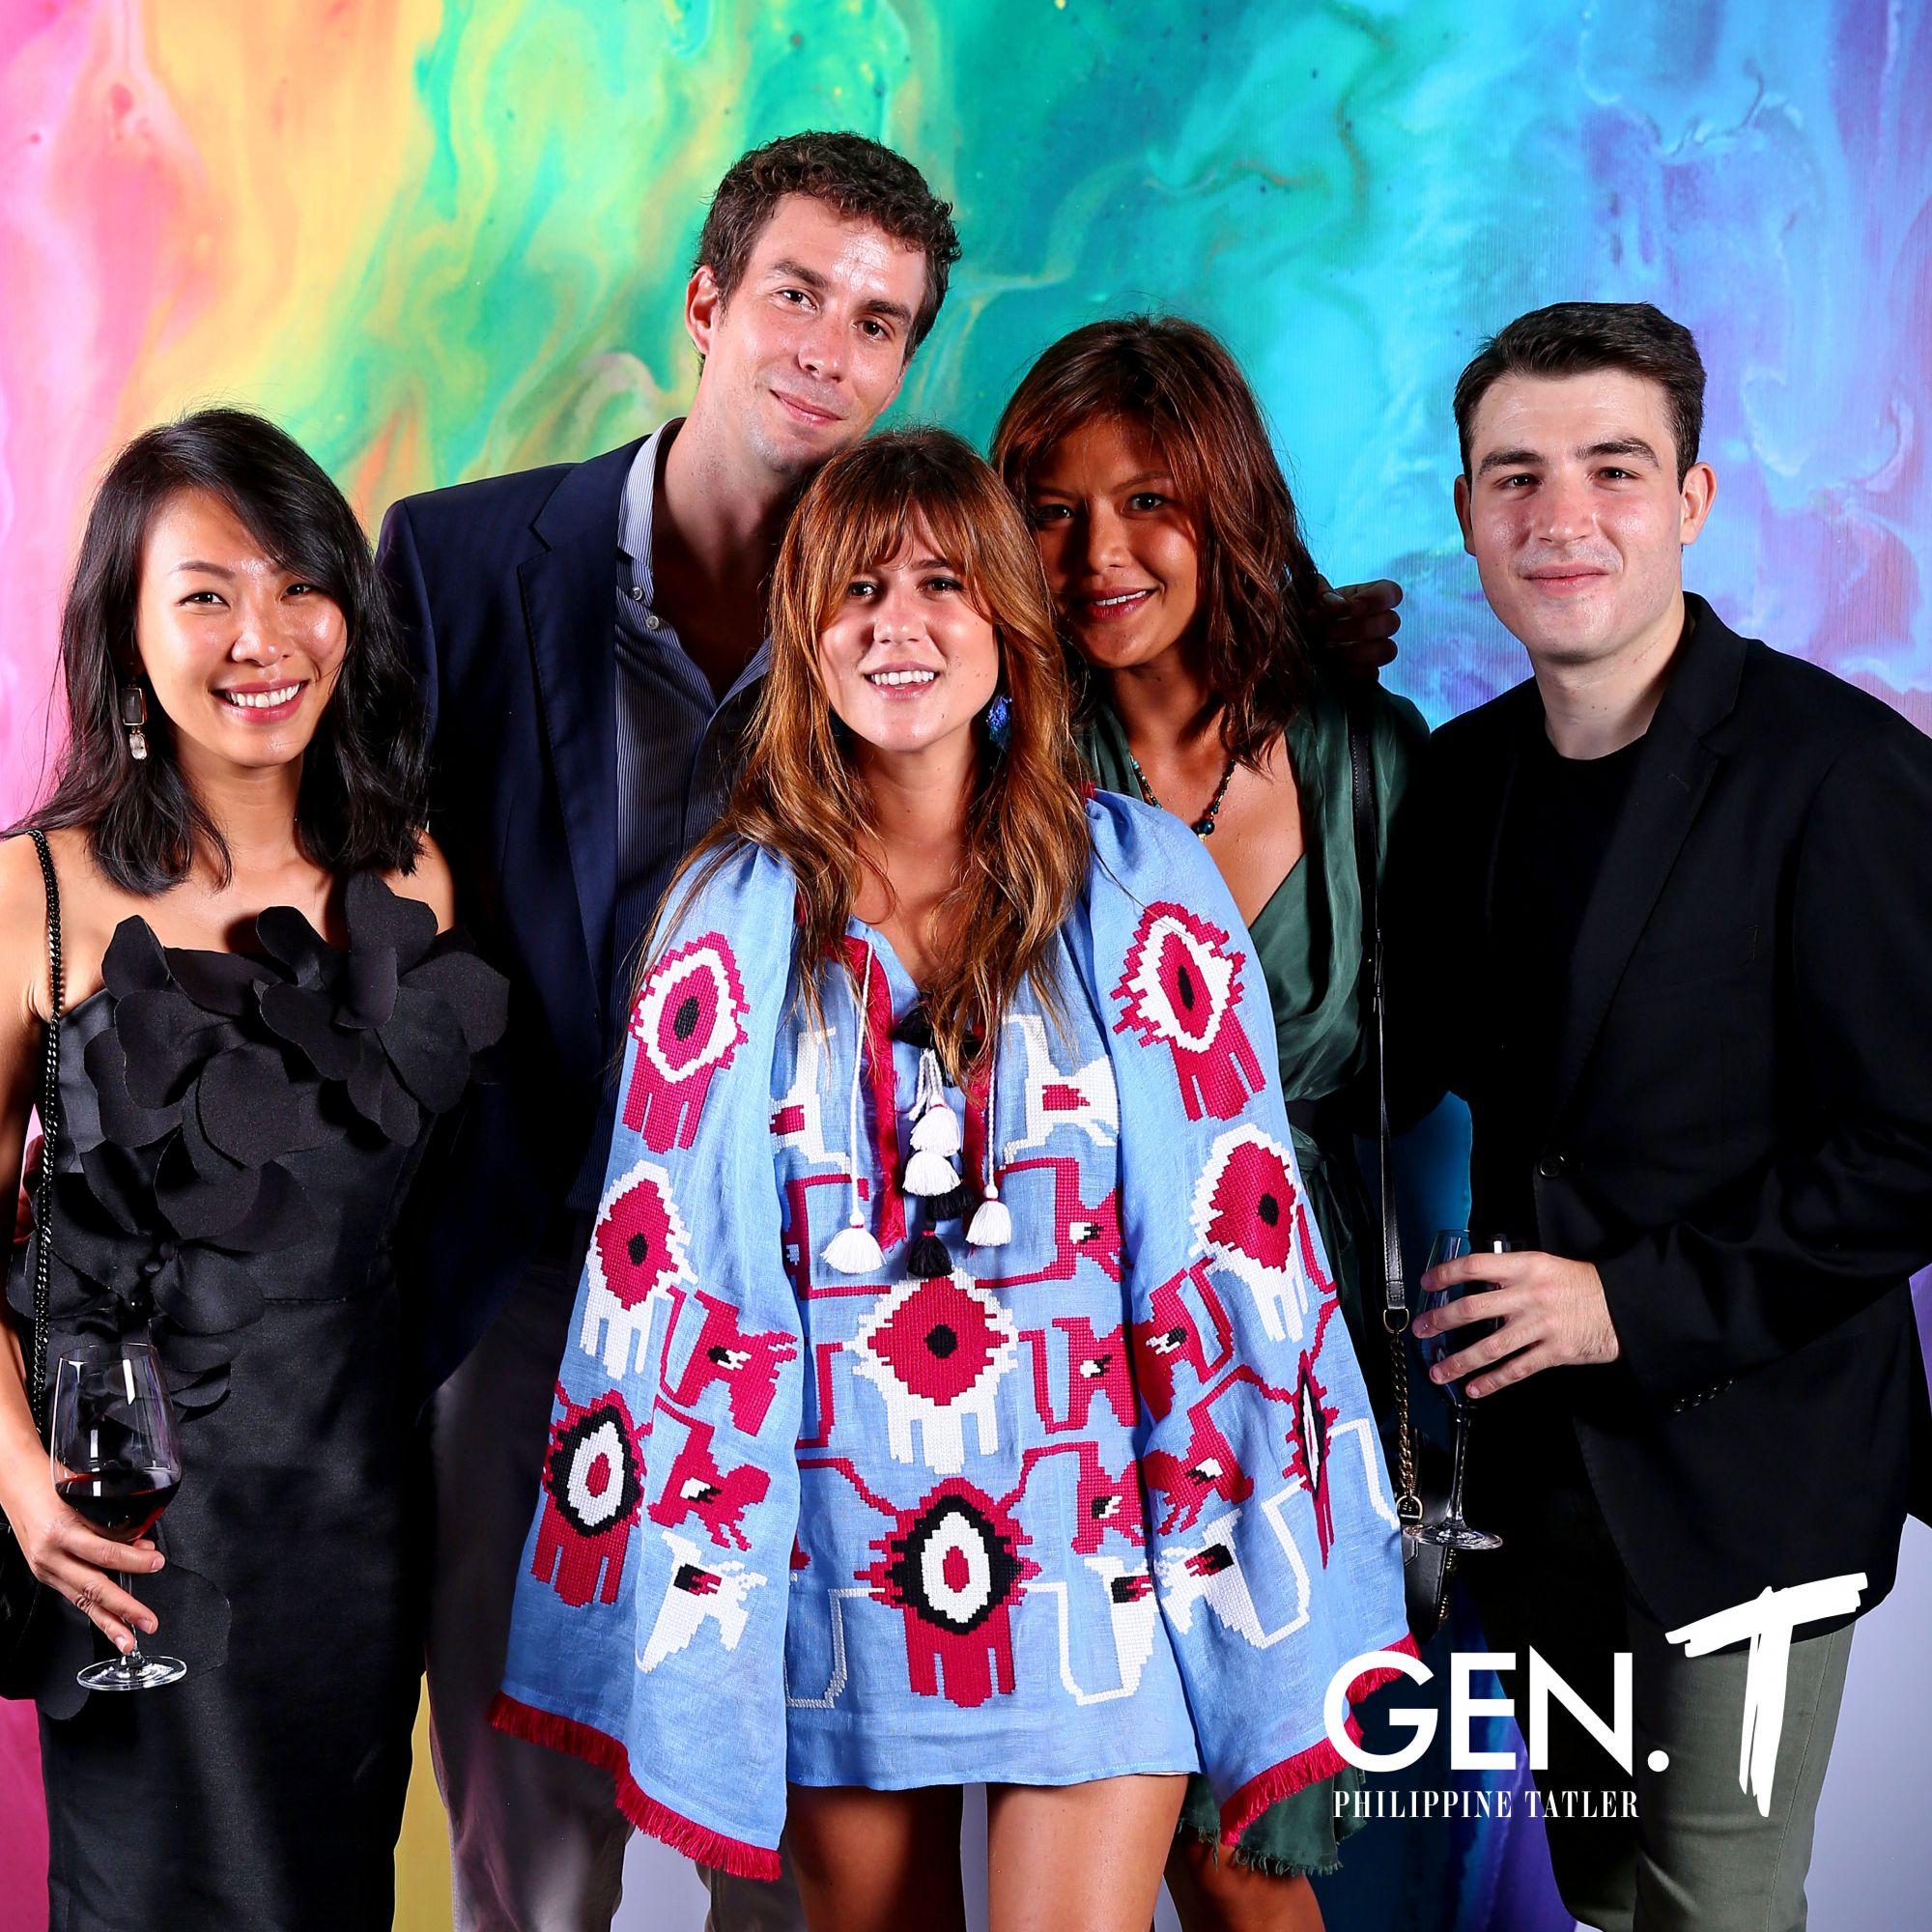 Andie Ngan, Mike Kerveillant, Paloma Urquijo Zobel, Ina Estacio, and Carlos Otermin